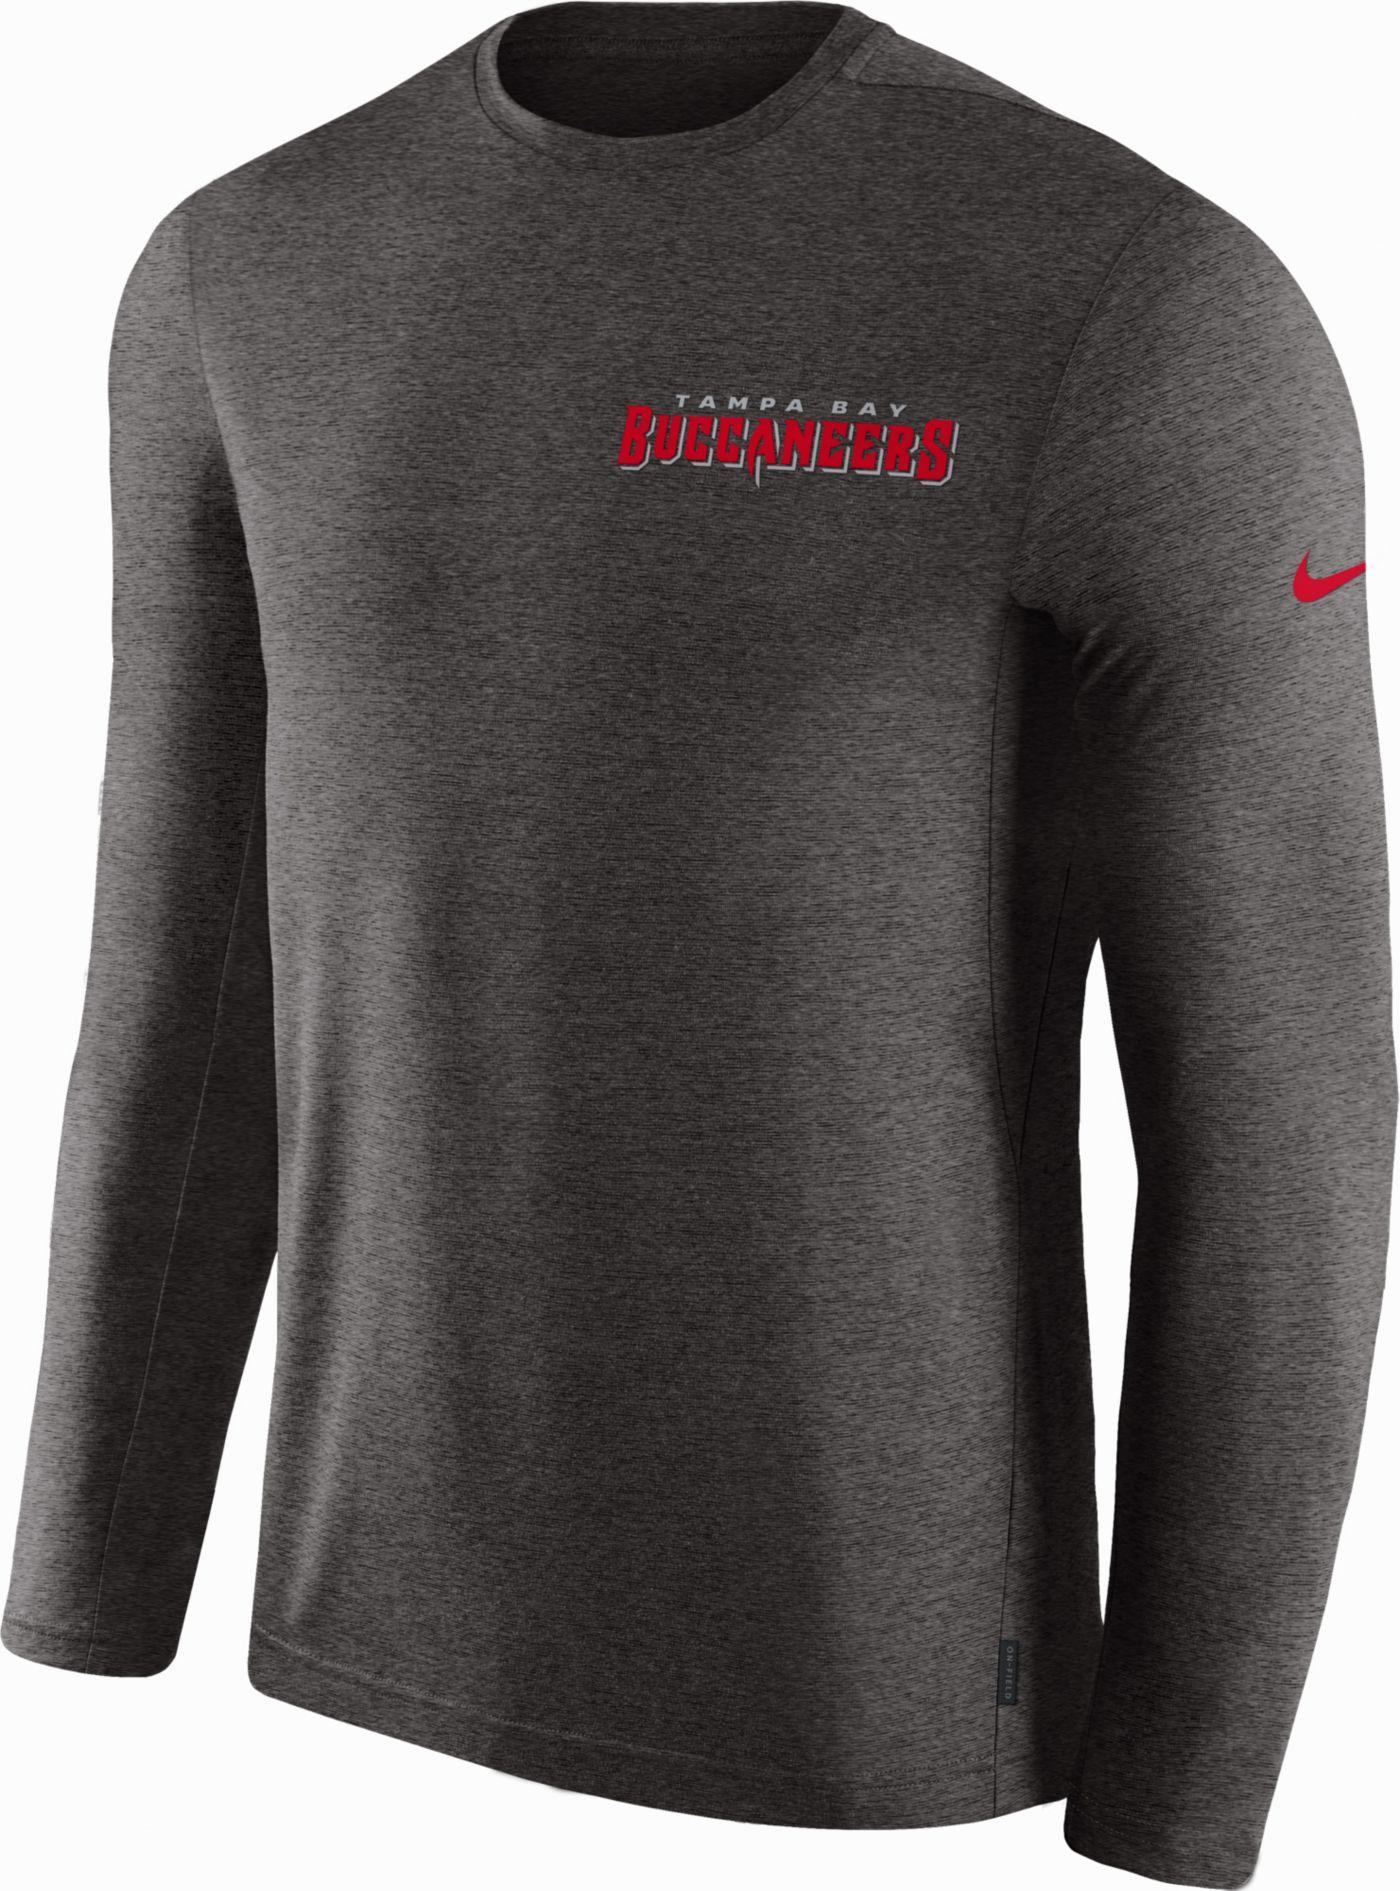 Nike Men's Tampa Bay Buccaneers Sideline Coach Performance Pewter Long Sleeve Shirt